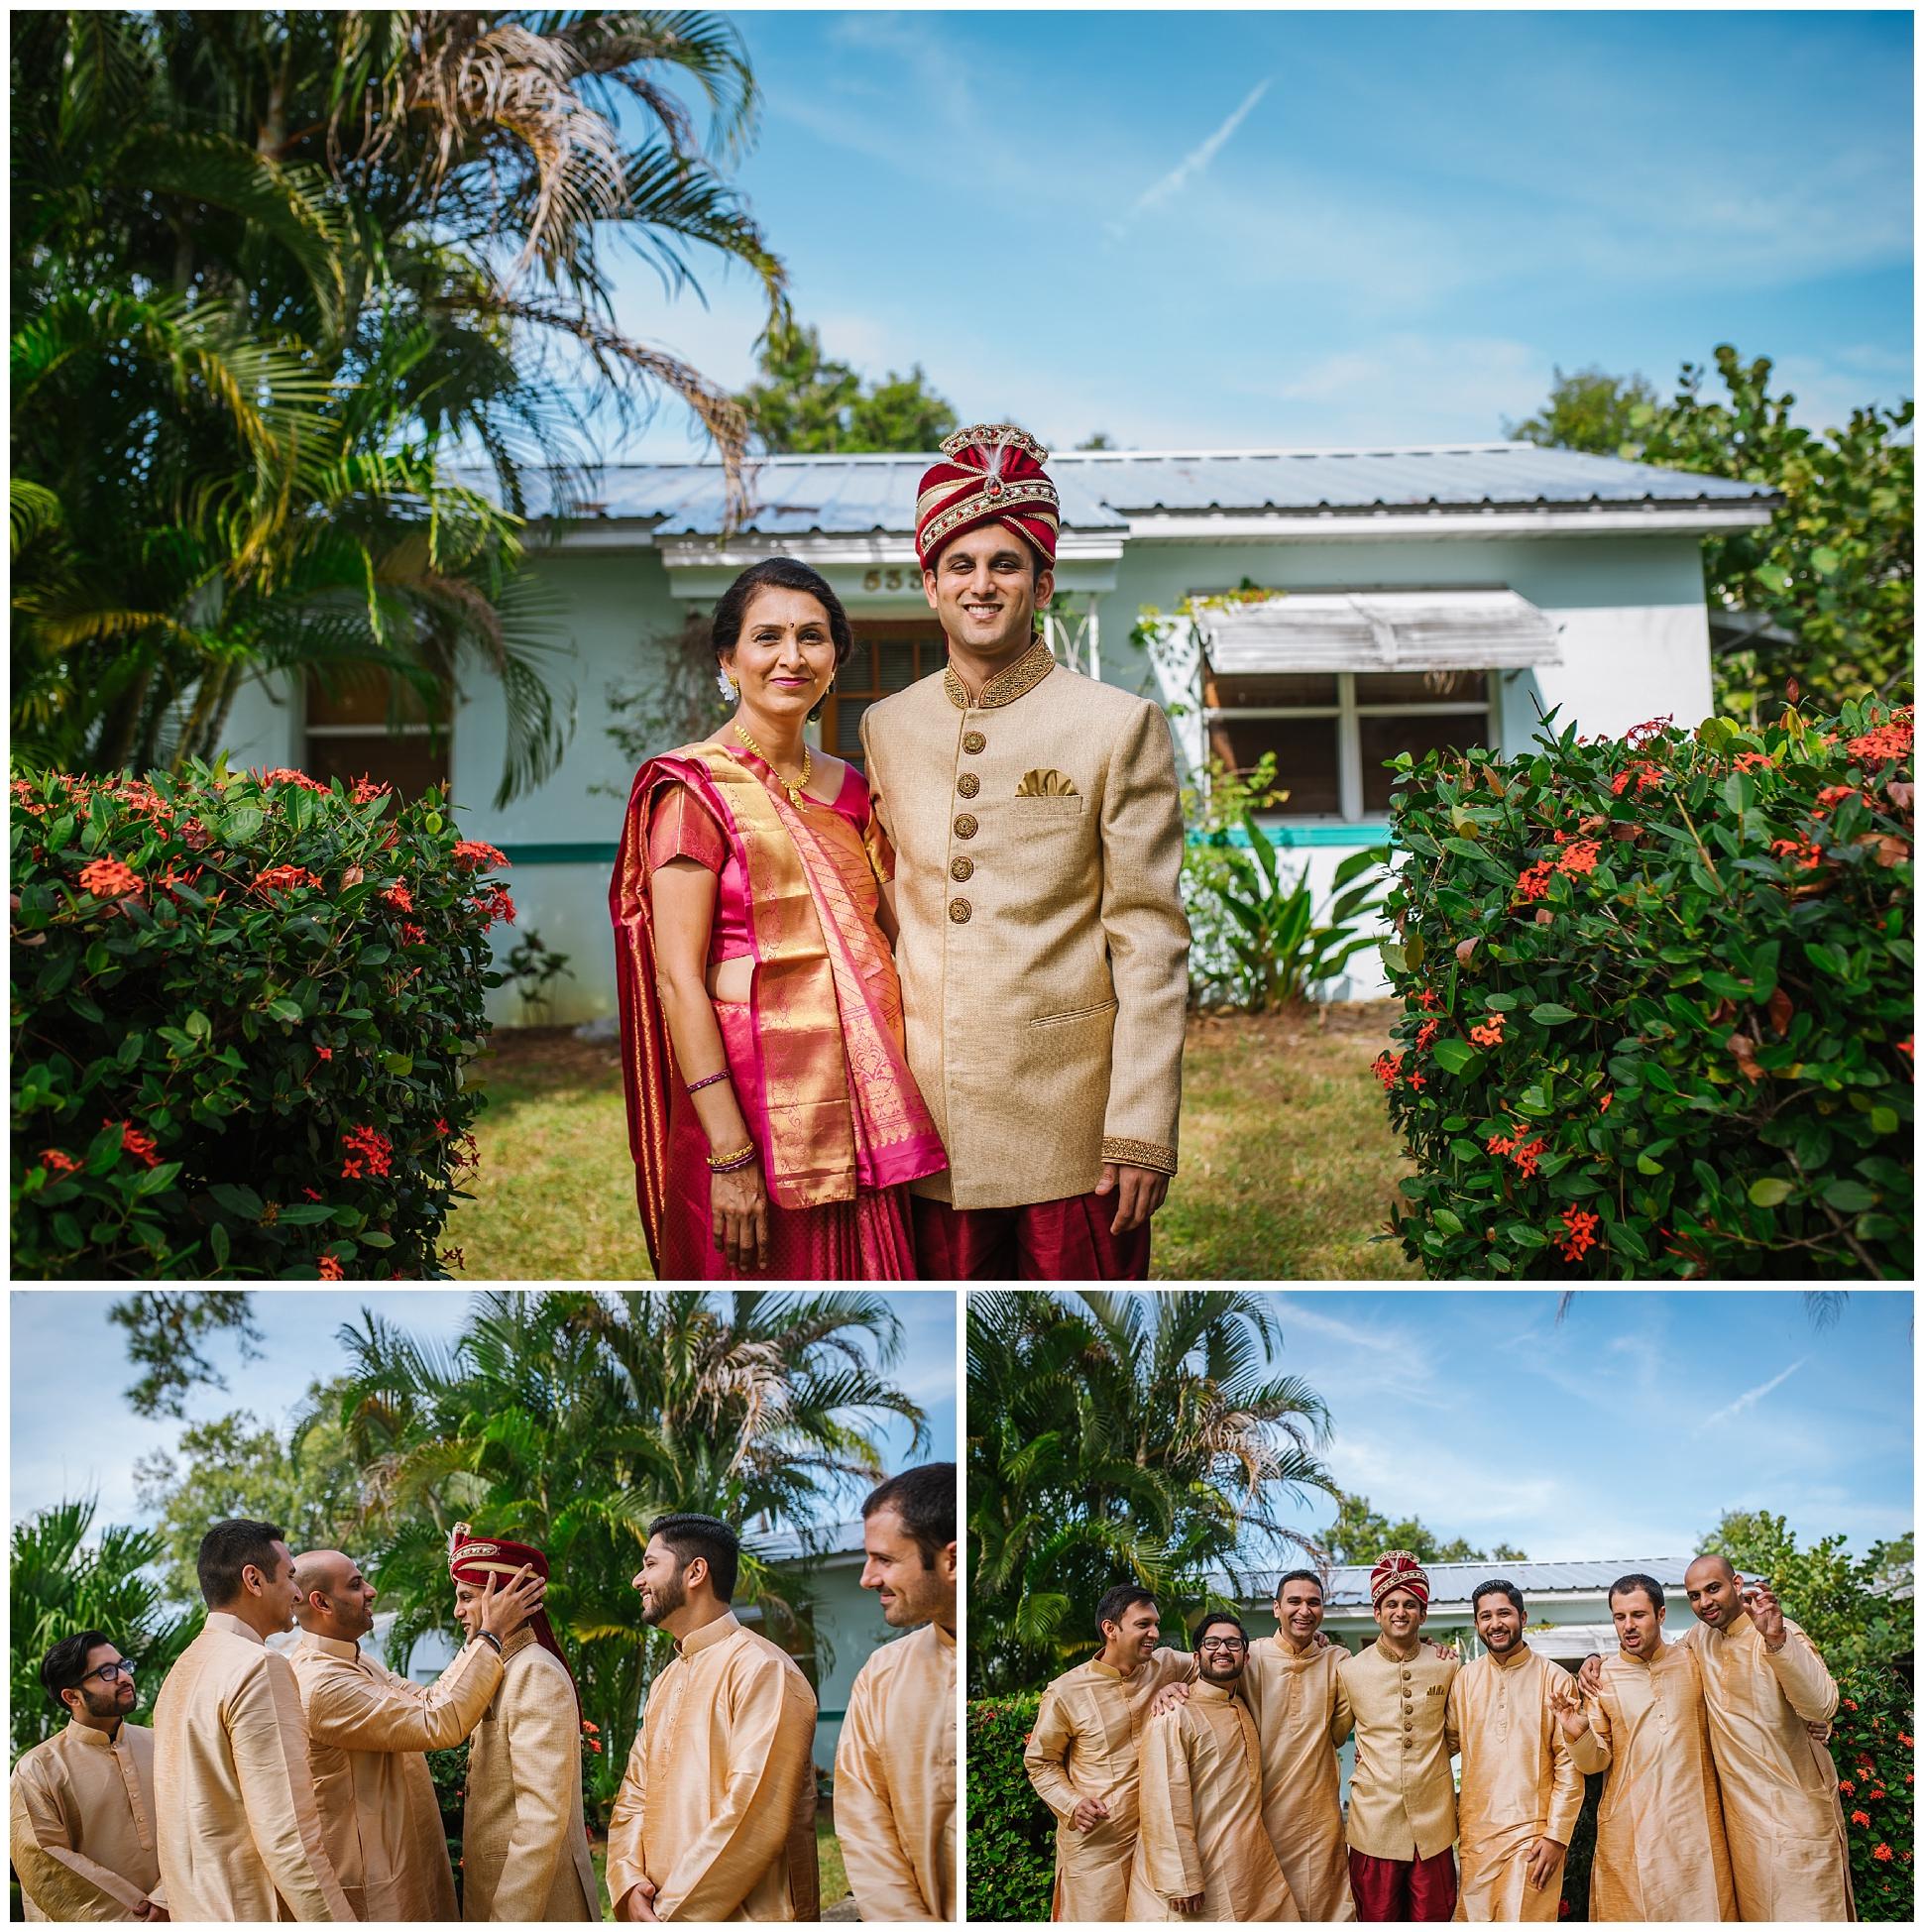 St-pete-indian-wedding-photographer-barat-sunken-gardens_0085.jpg